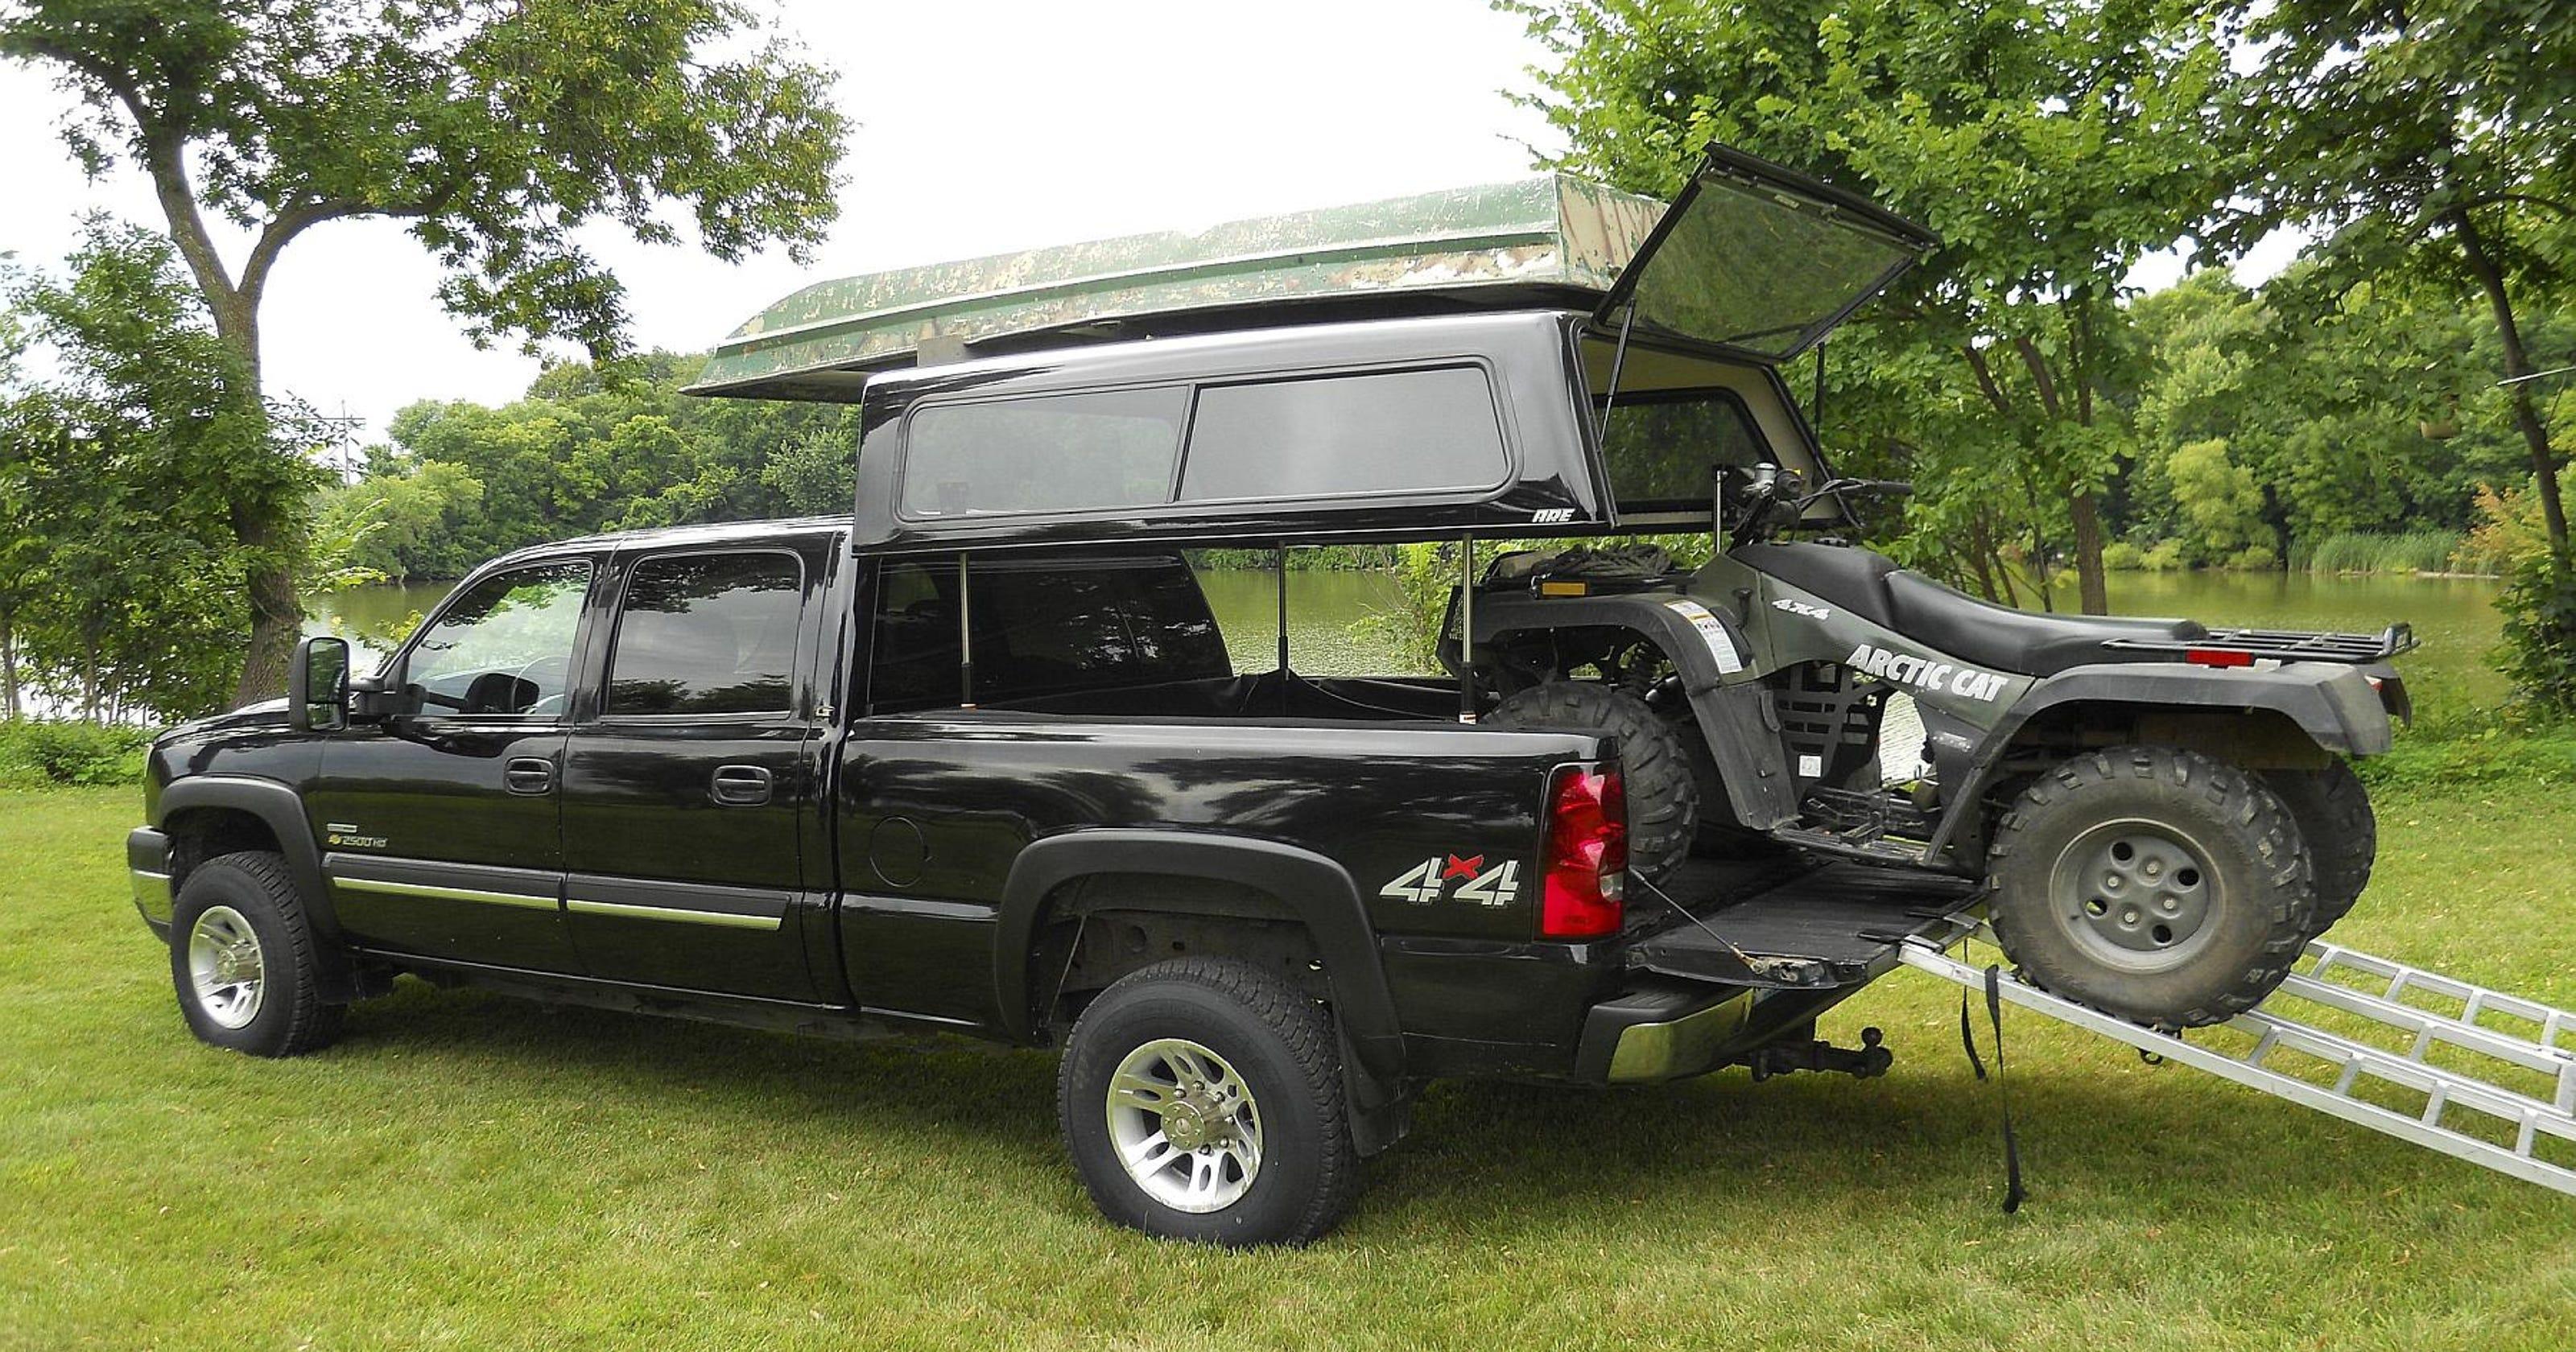 EZ lift lets truck bed cap rise, convert to camper